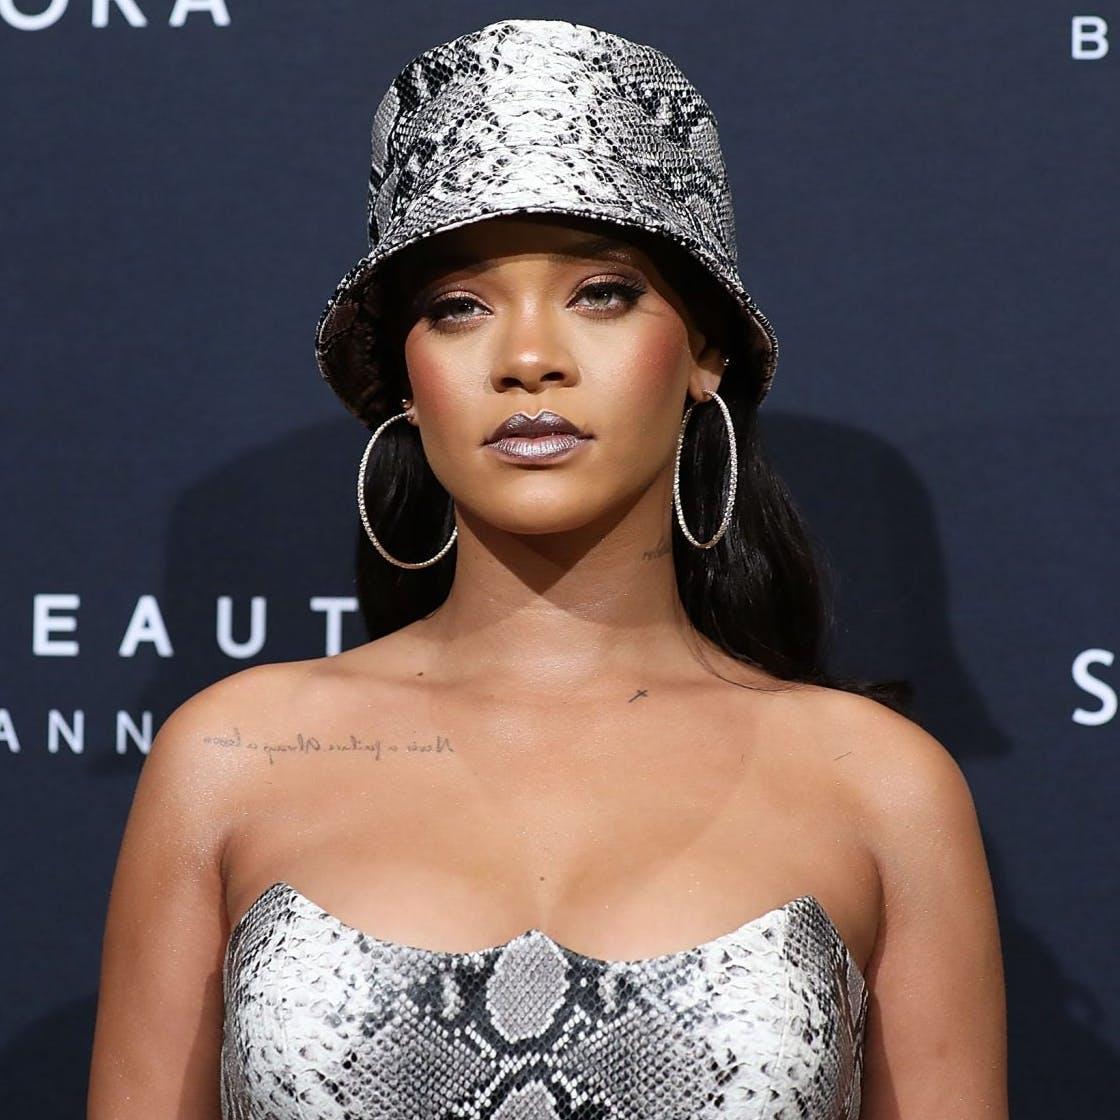 Rihanna And LVMH To Launch Luxury Fashion Brand, According